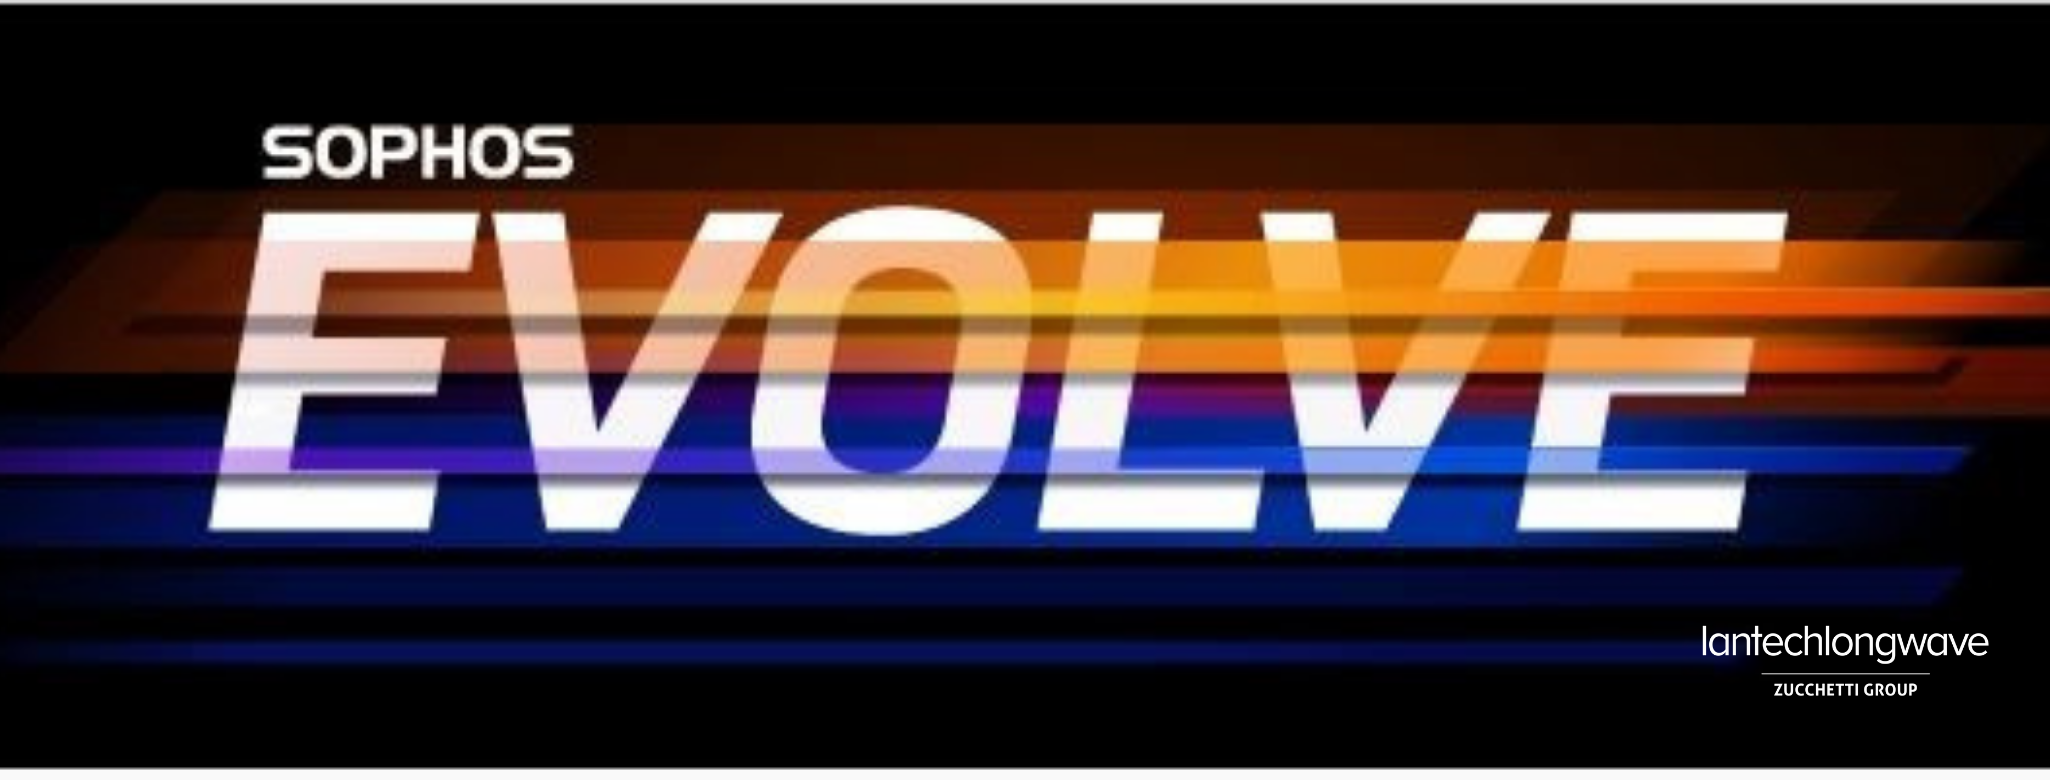 27.11.20 -  Sophos EVOLVE Cybersecurity Summit